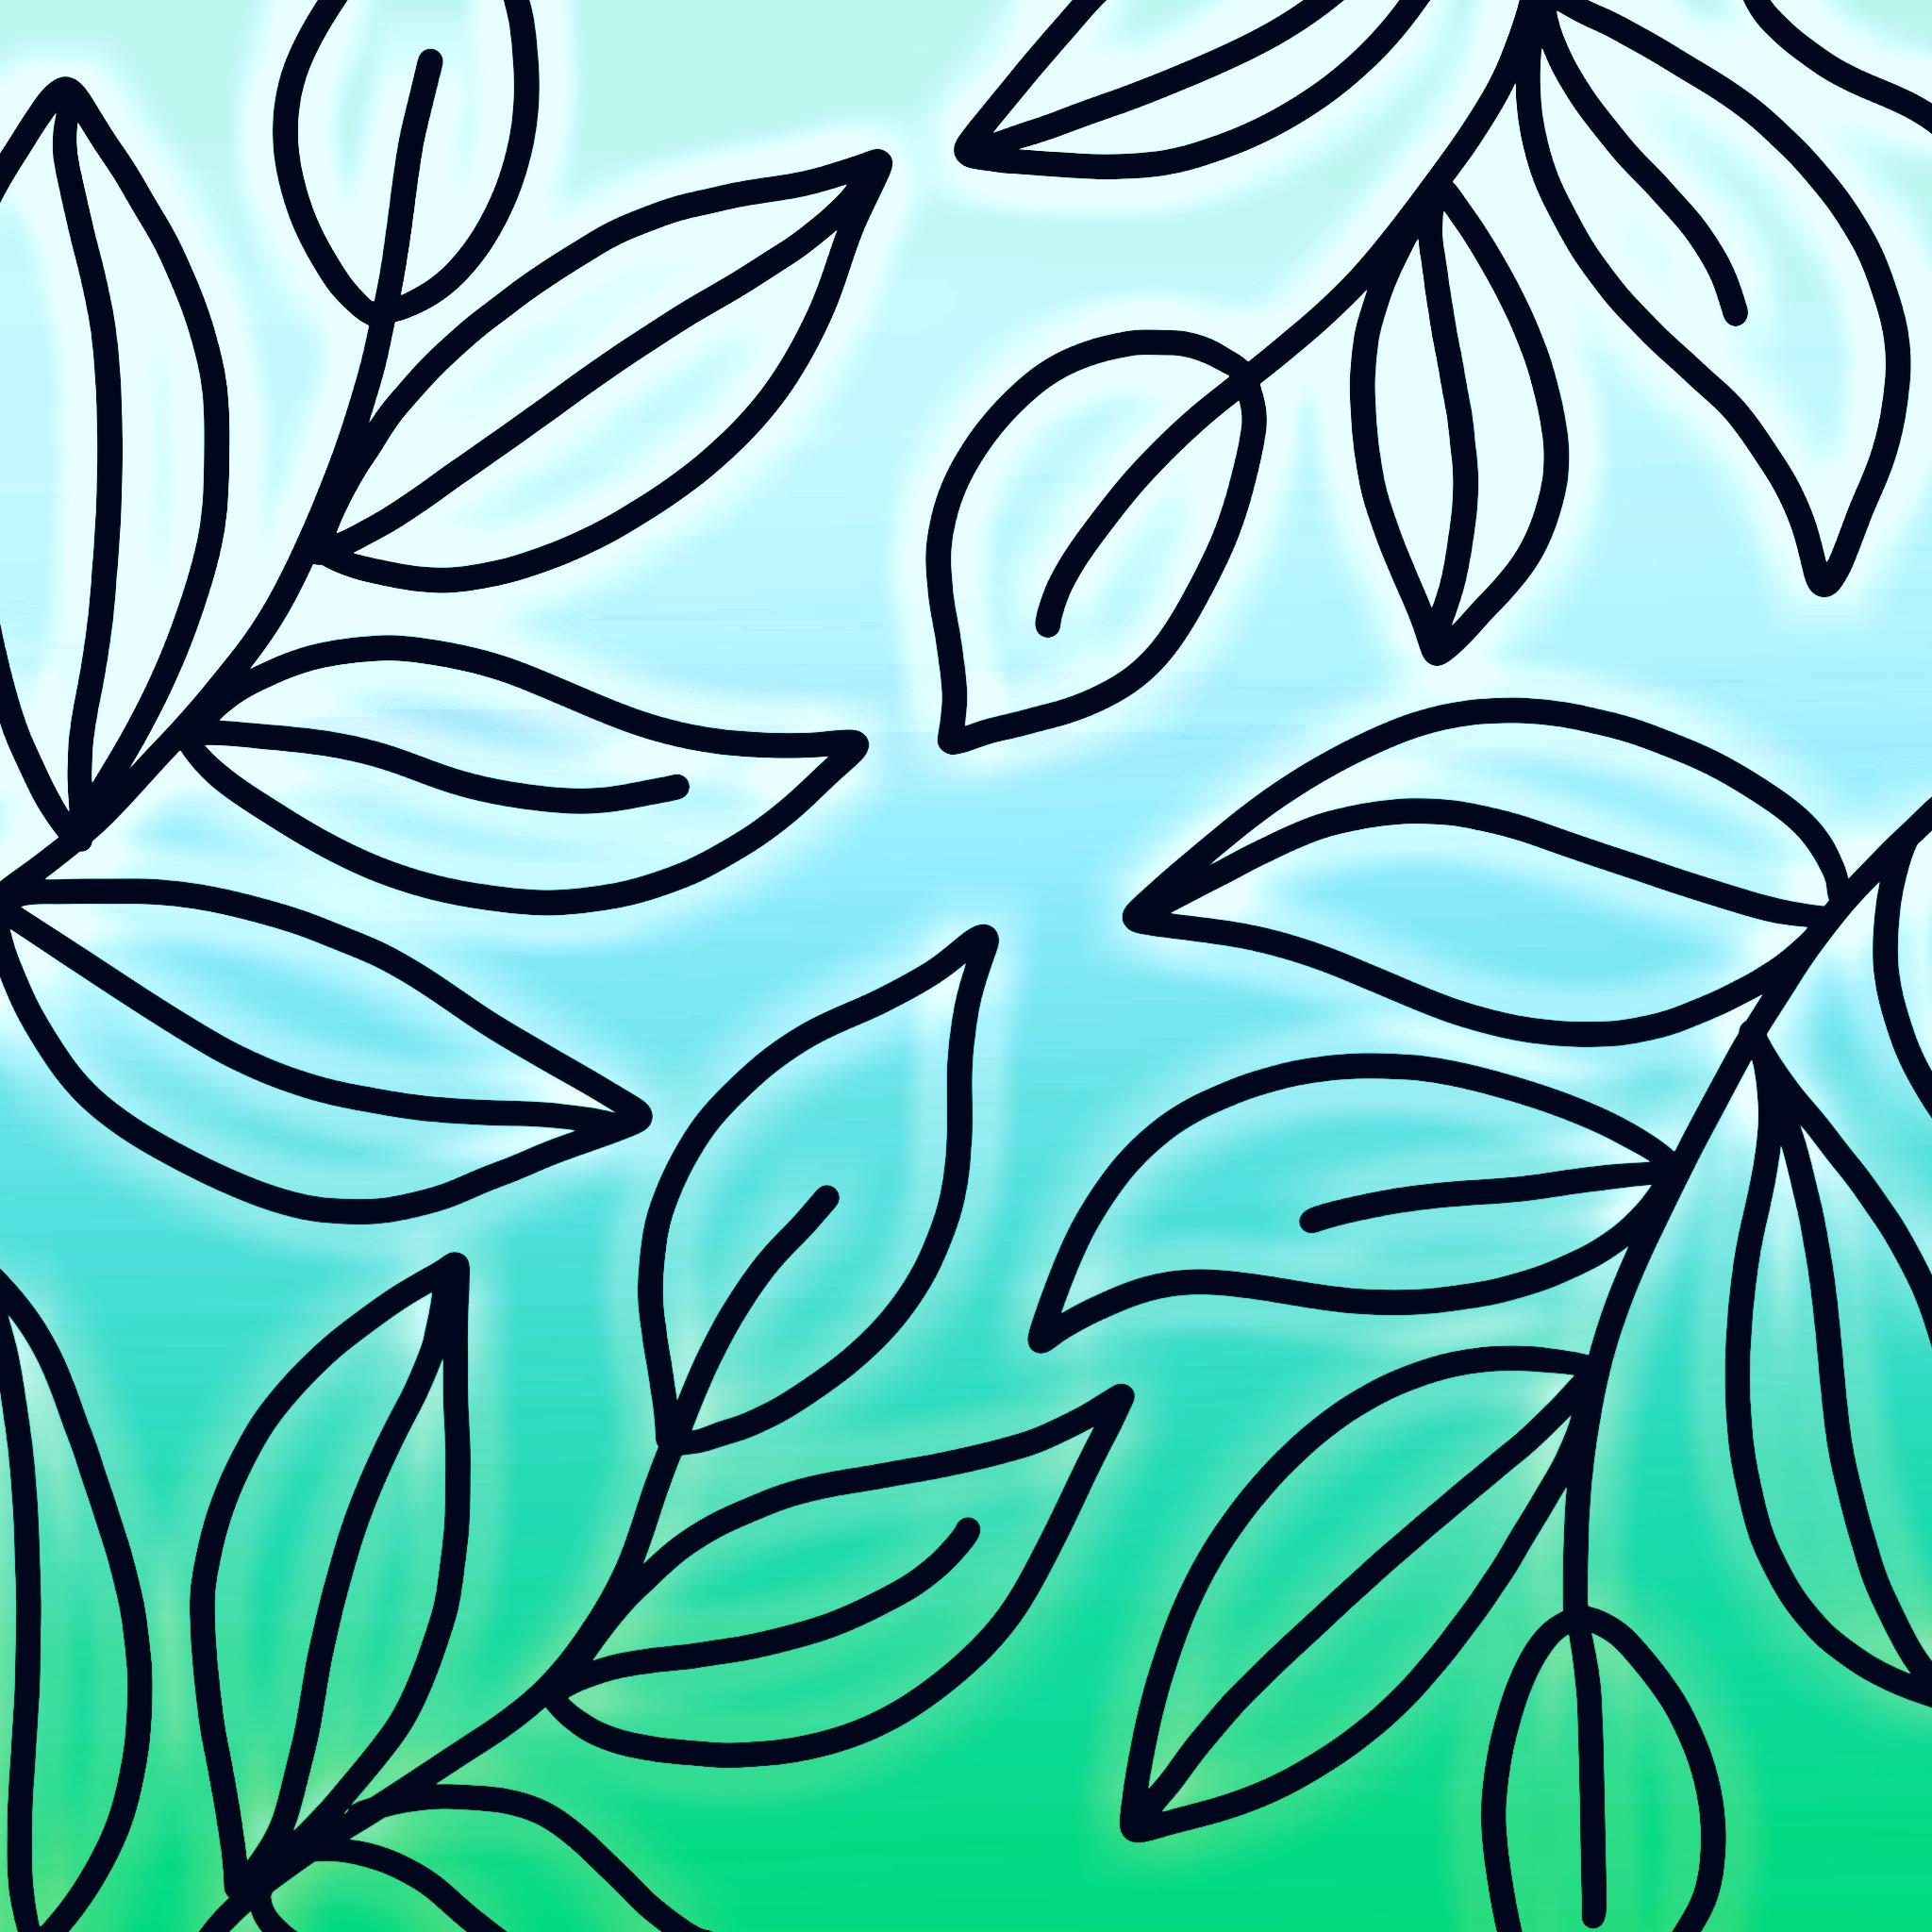 Plant leaves design illustration